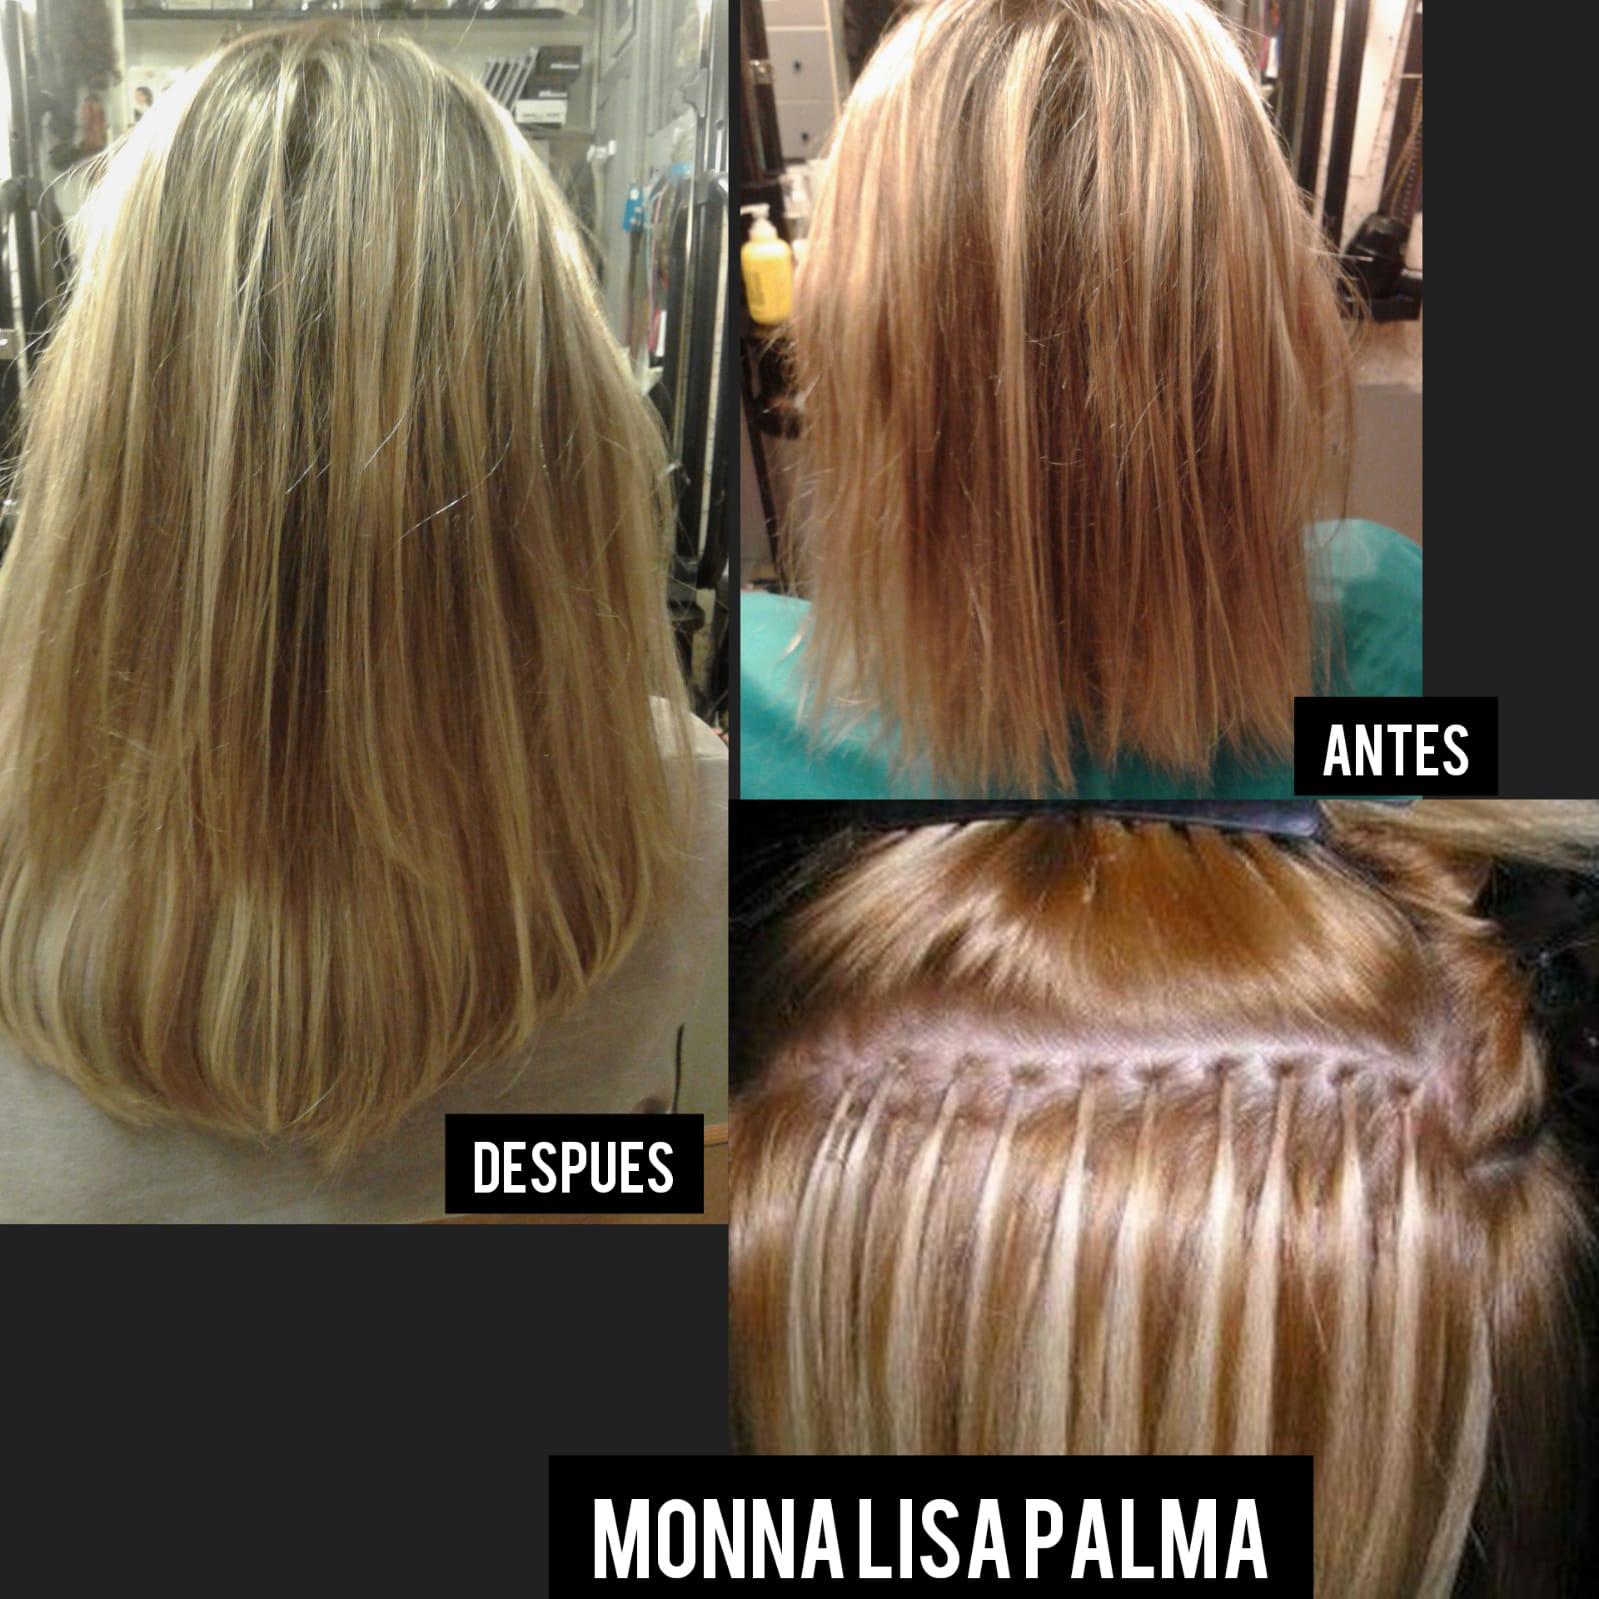 3-EXTENSIONES-CON-QUERATINA-MONNALISA-PALMA